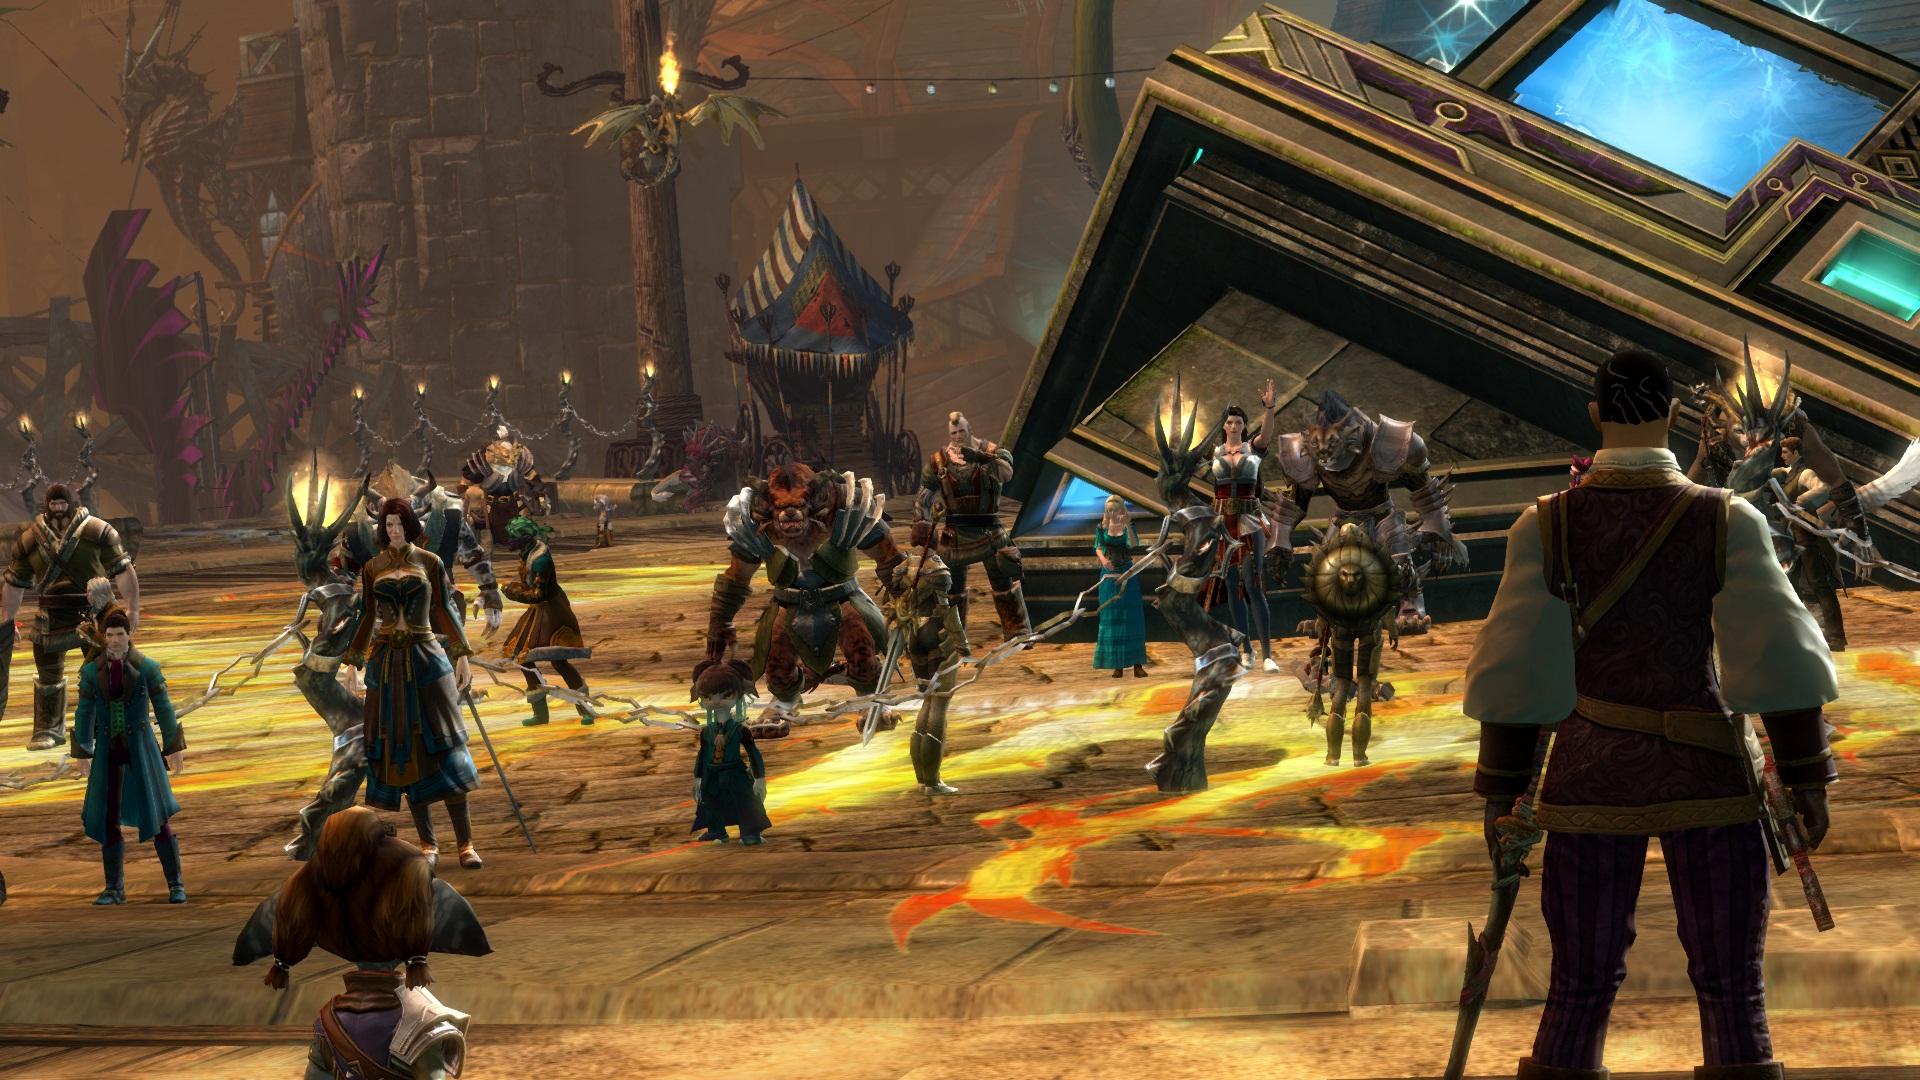 Guild Wars 2 Data: June 2013